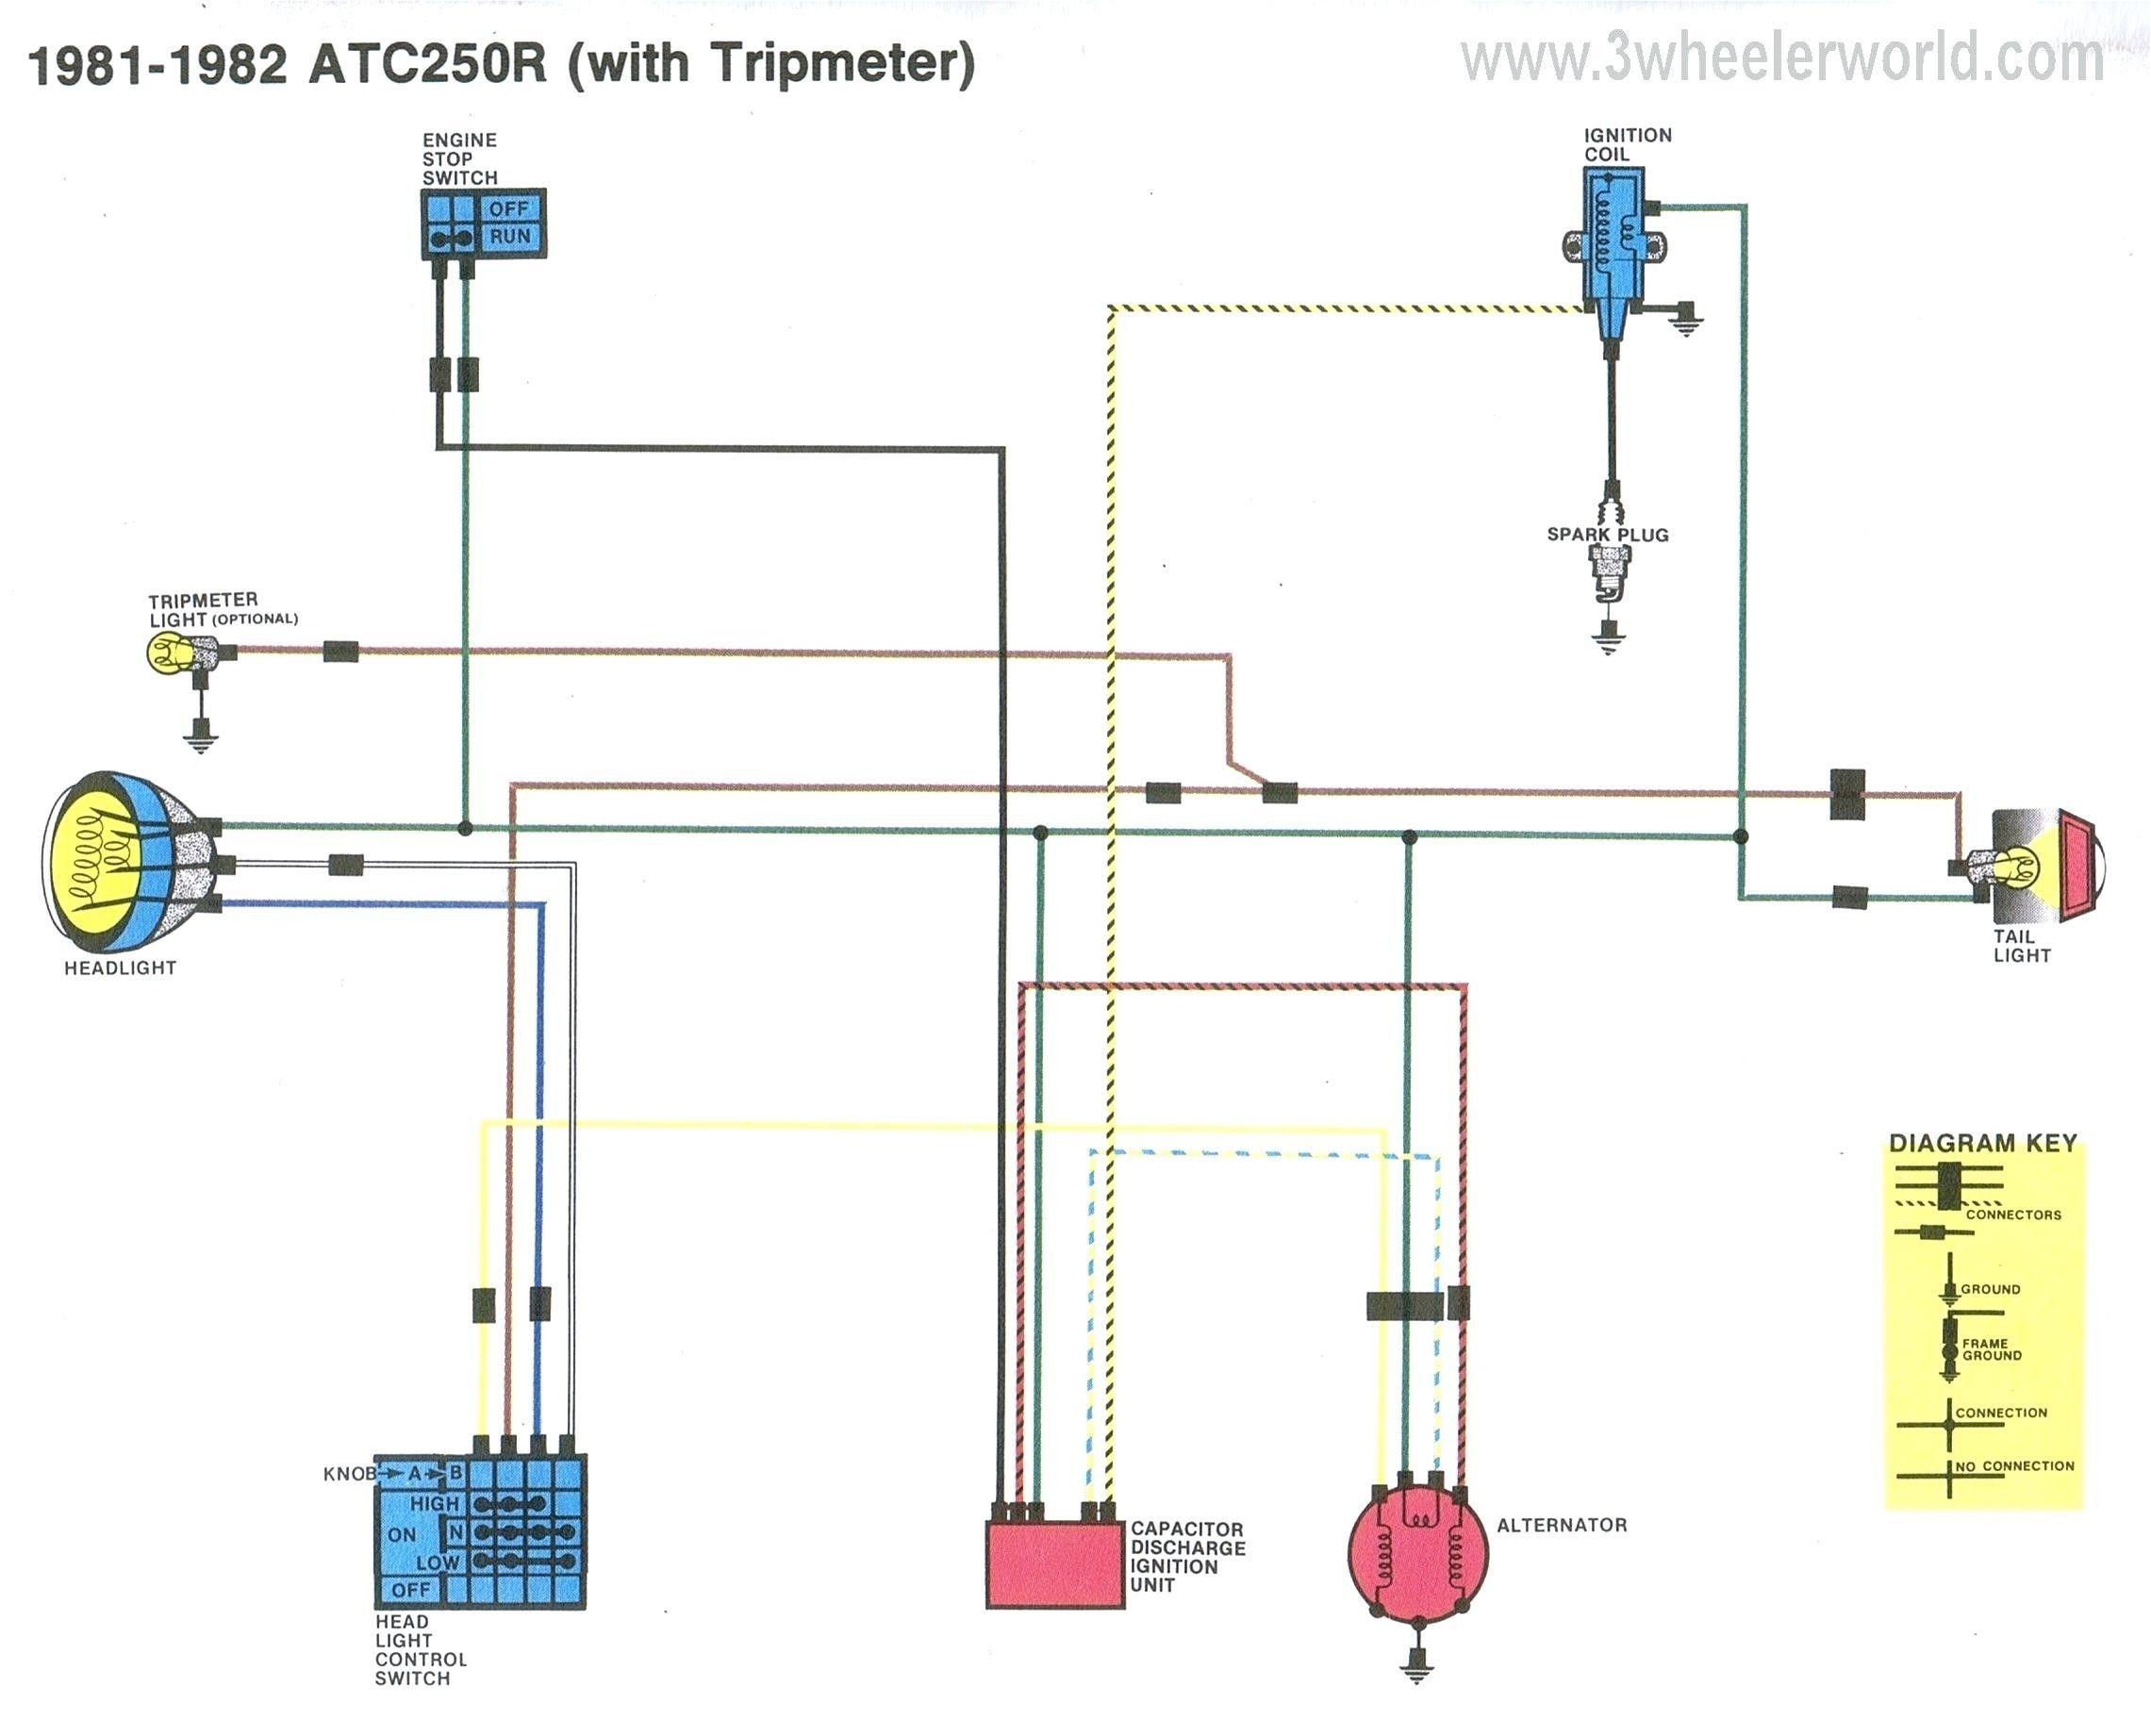 Honda Xrm 125 Cdi Wiring Diagram Wiring Diagram Host Motorcycle Wiring Honda Motorcycles Electrical Wiring Diagram